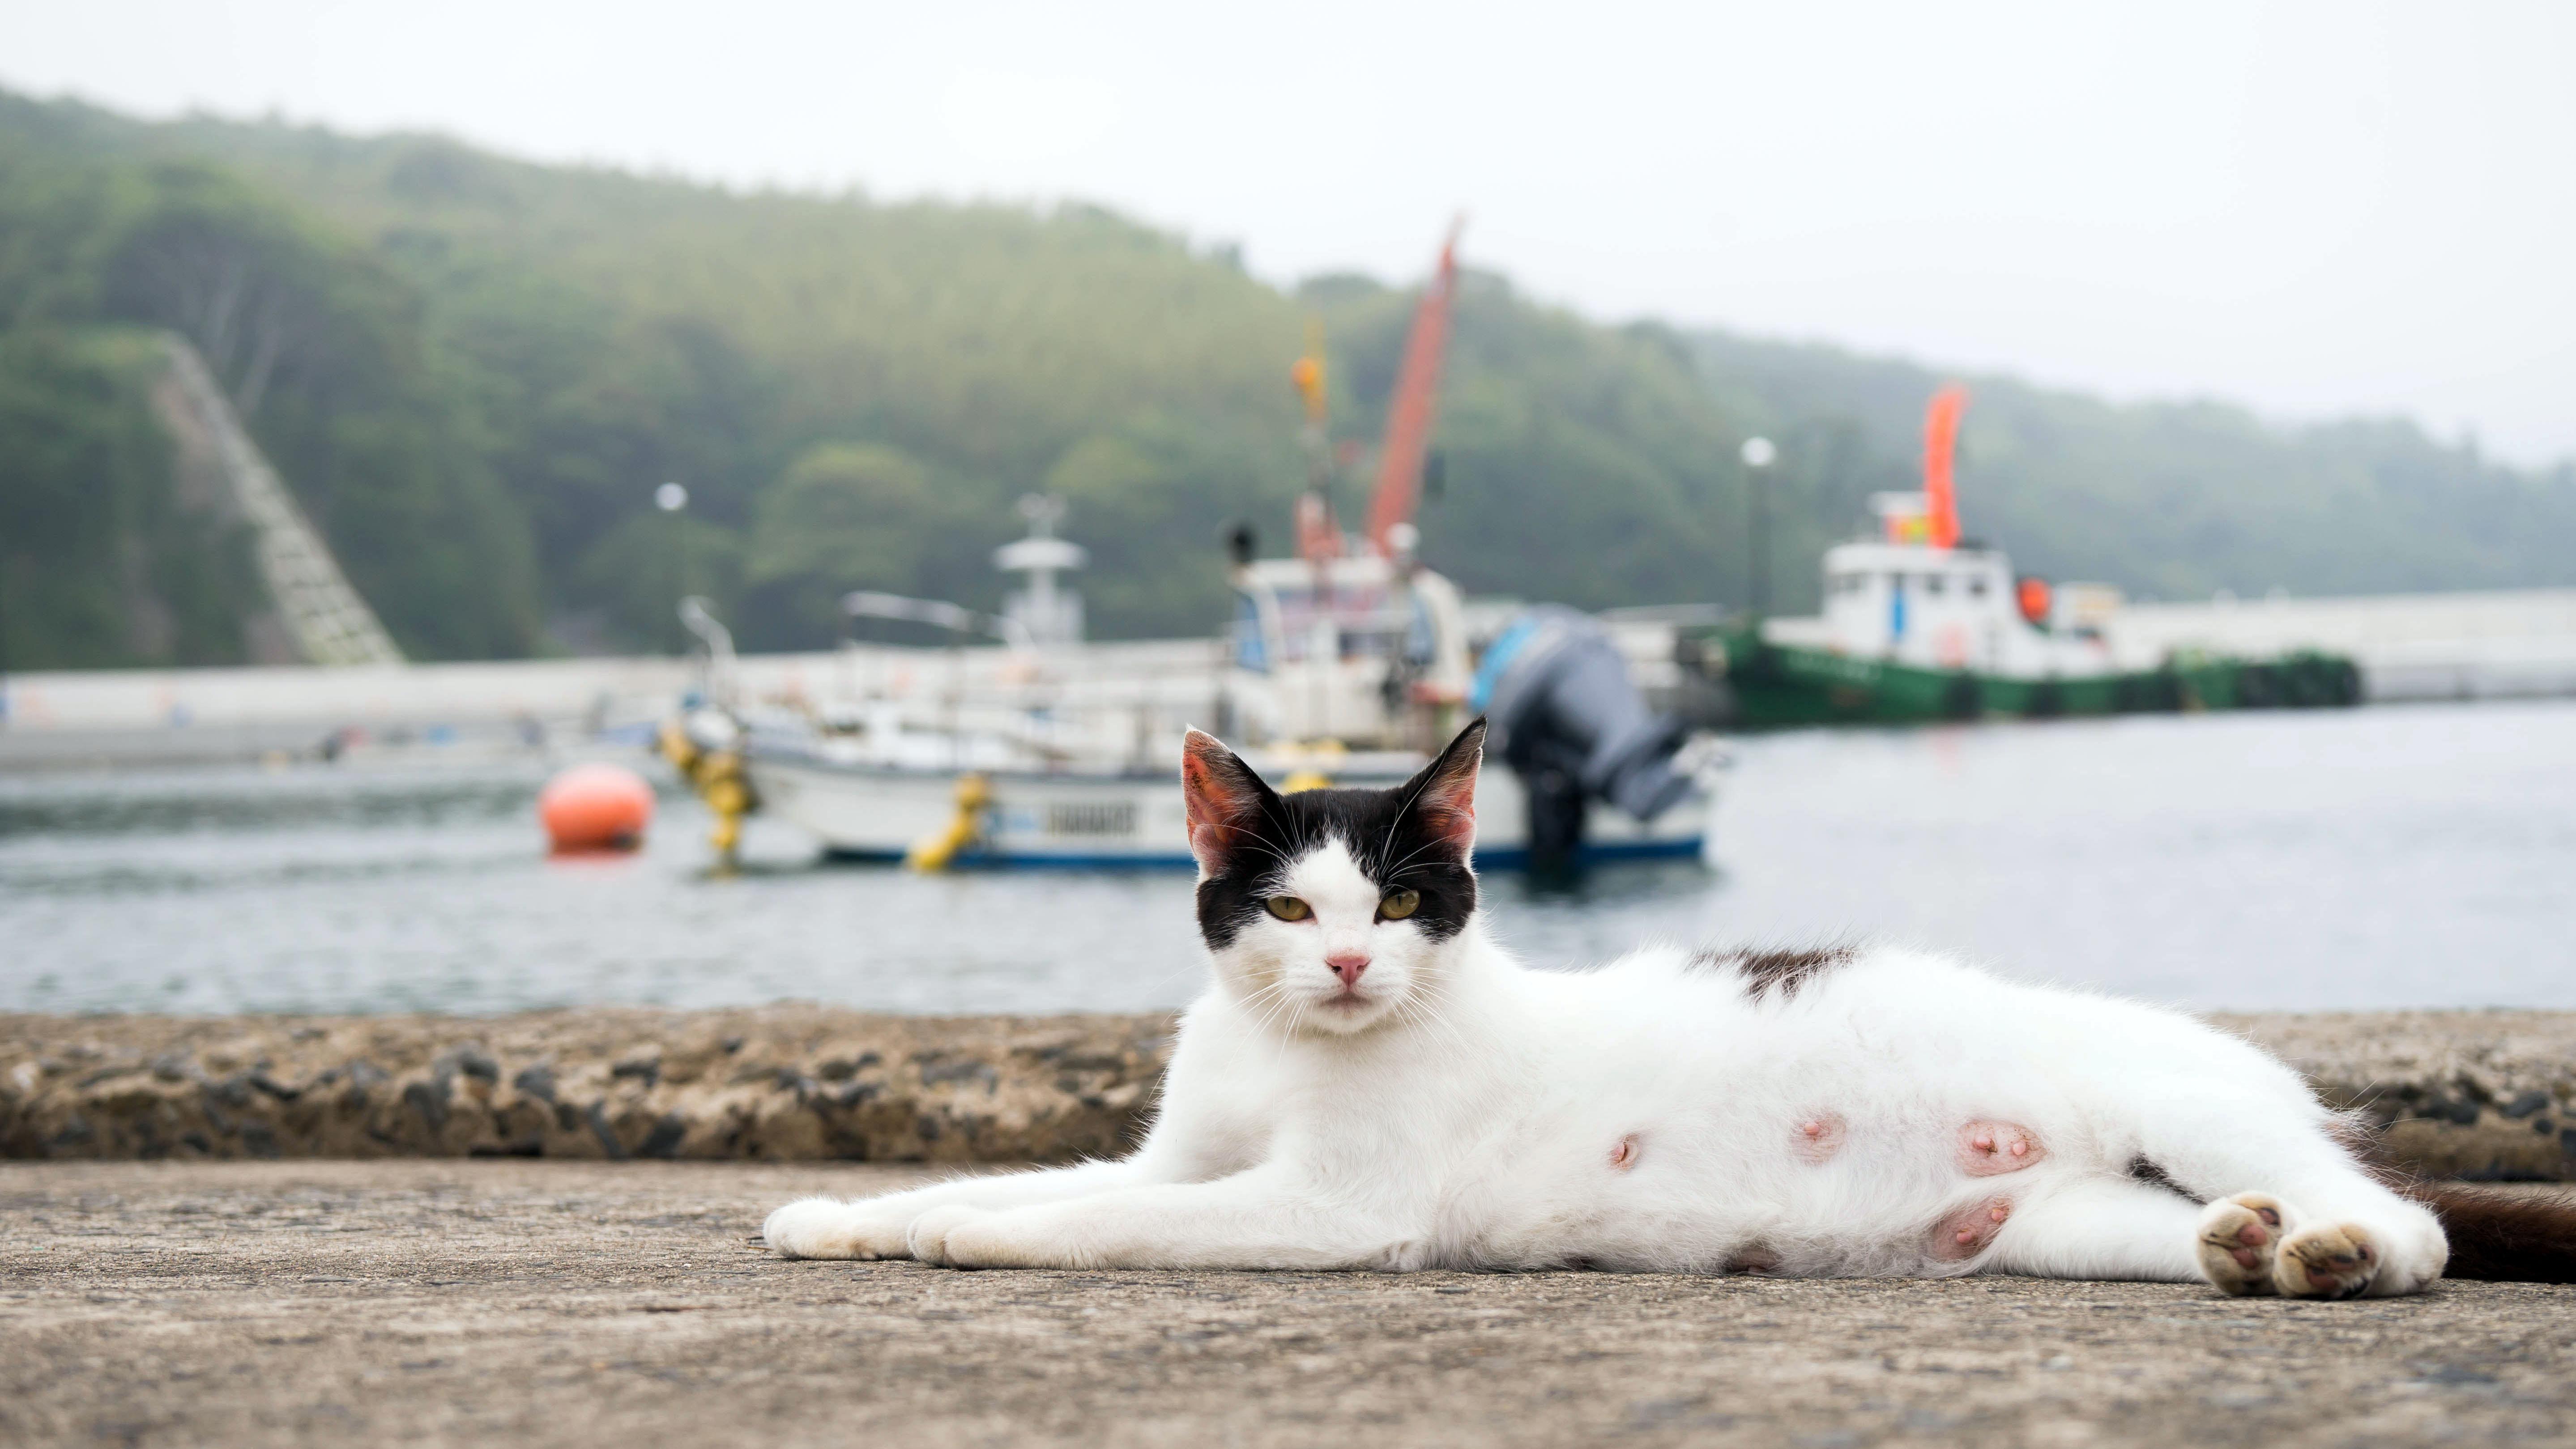 Tashirojima, Pulau di Jepang yang 'Dikuasai' Ratusan Kucing